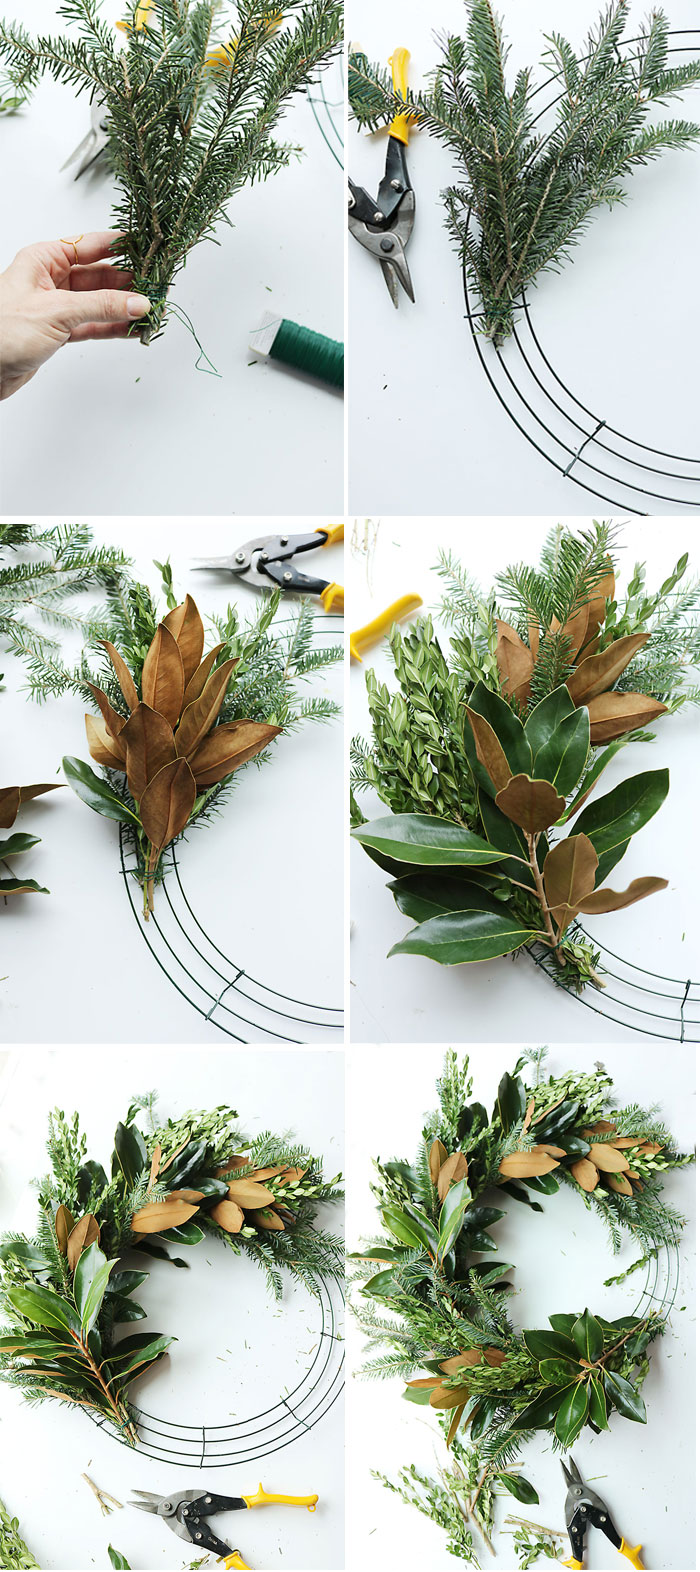 magnolia-wreath-diy-step-by-step, magnolia-wreath-diy, magnolia wreath diy, magnolia christmas decoration, southern christmas, christmas wreath diy, how to make a magnolia wreath tutorial, mixed branch christmas wreath, cedar wreath, instructions, how to make wreath, DIY wreath